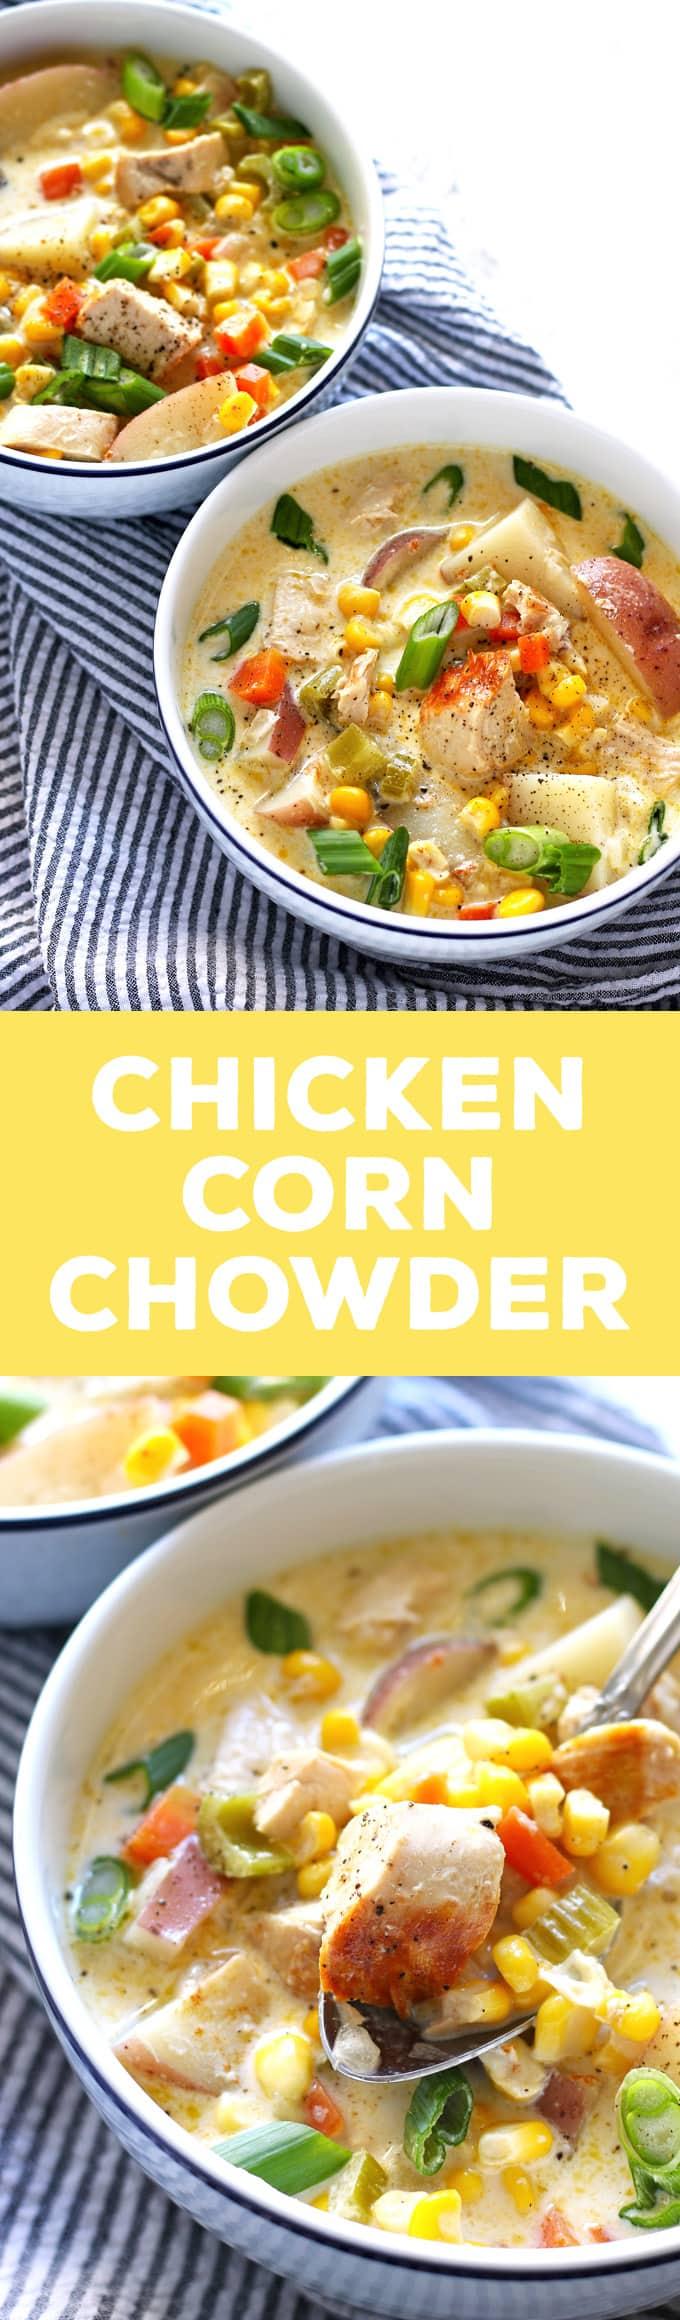 chicken corn chowder pin